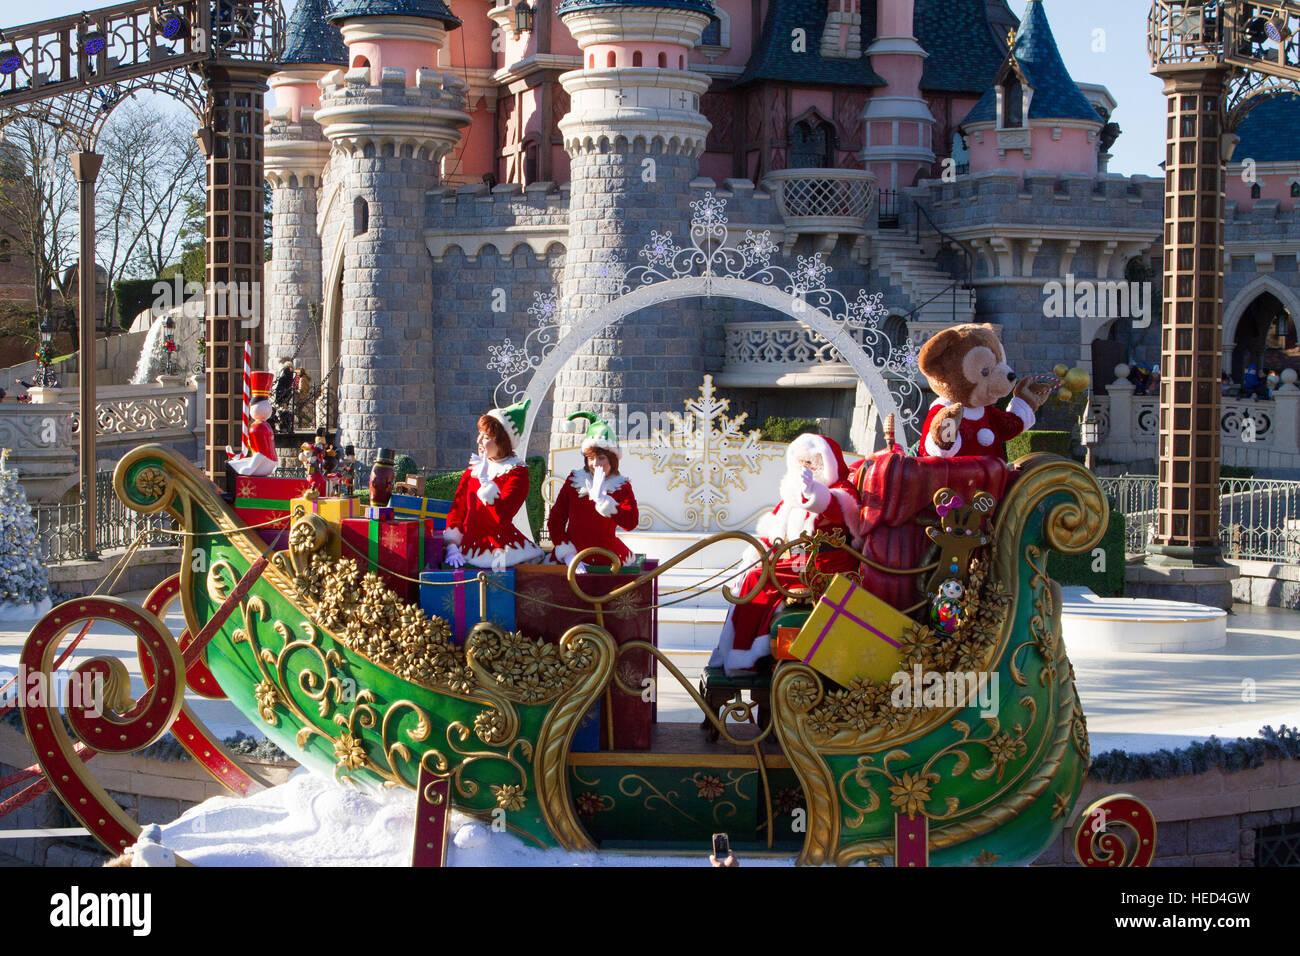 Christmas parade at Disneyland Paris Marne La Vallee France Stock Photo